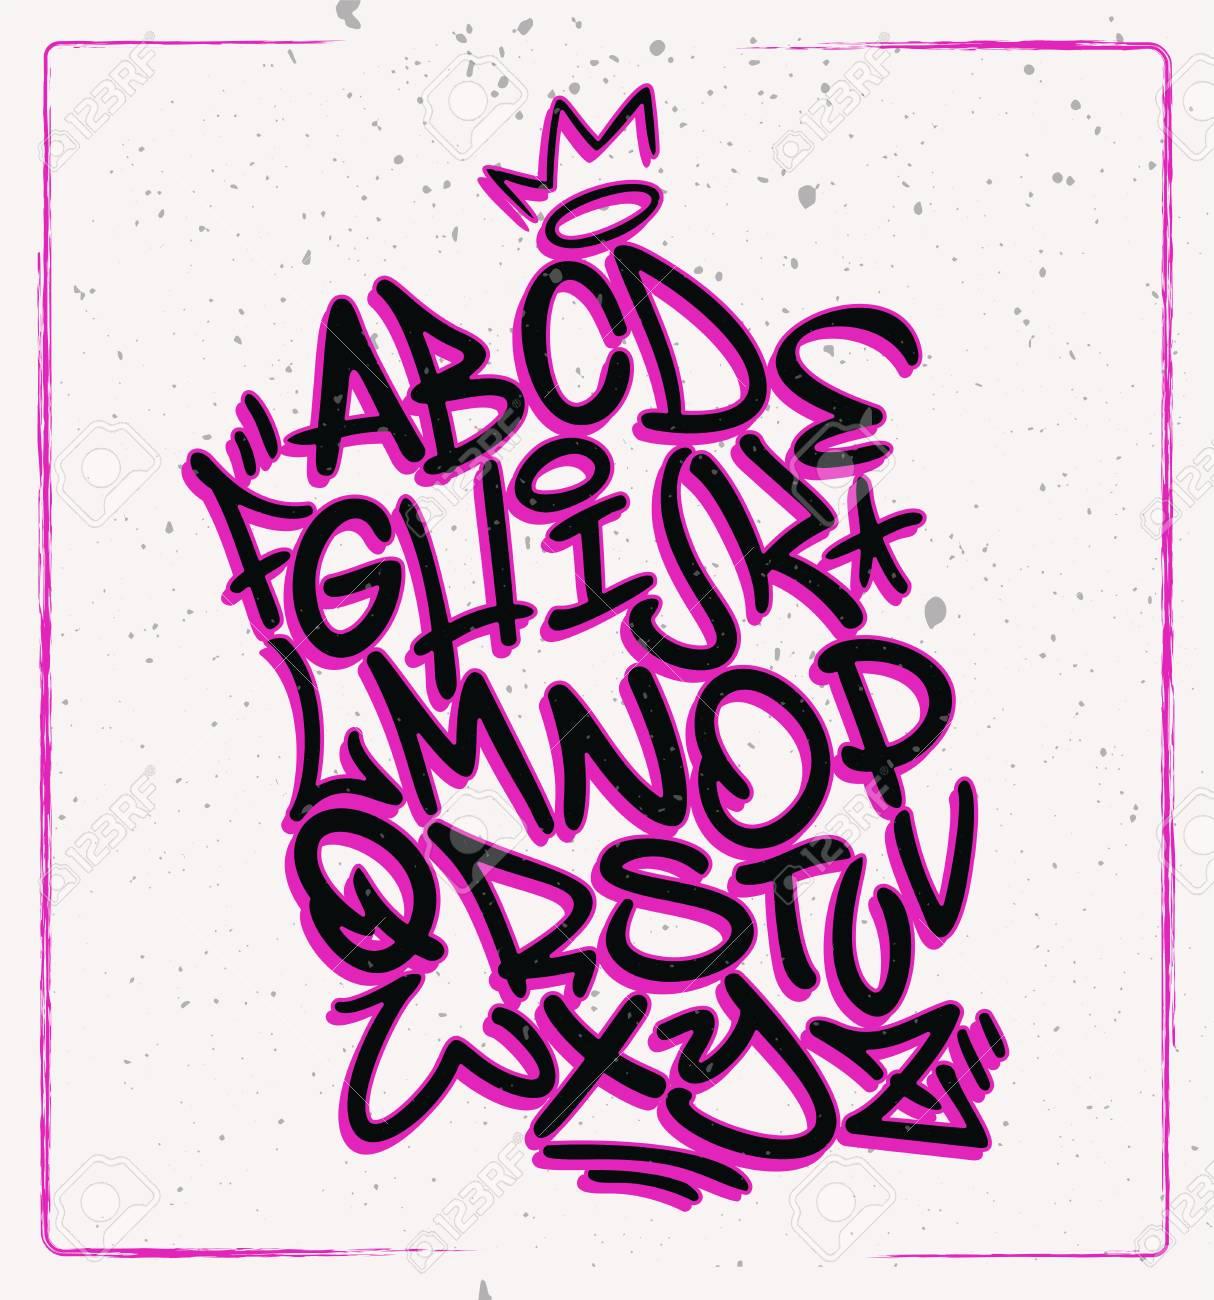 Handwritten Graffiti Font Alphabet Artistic Hip Hop Typography Collection Custom Vector Calligraphy Graphic Set